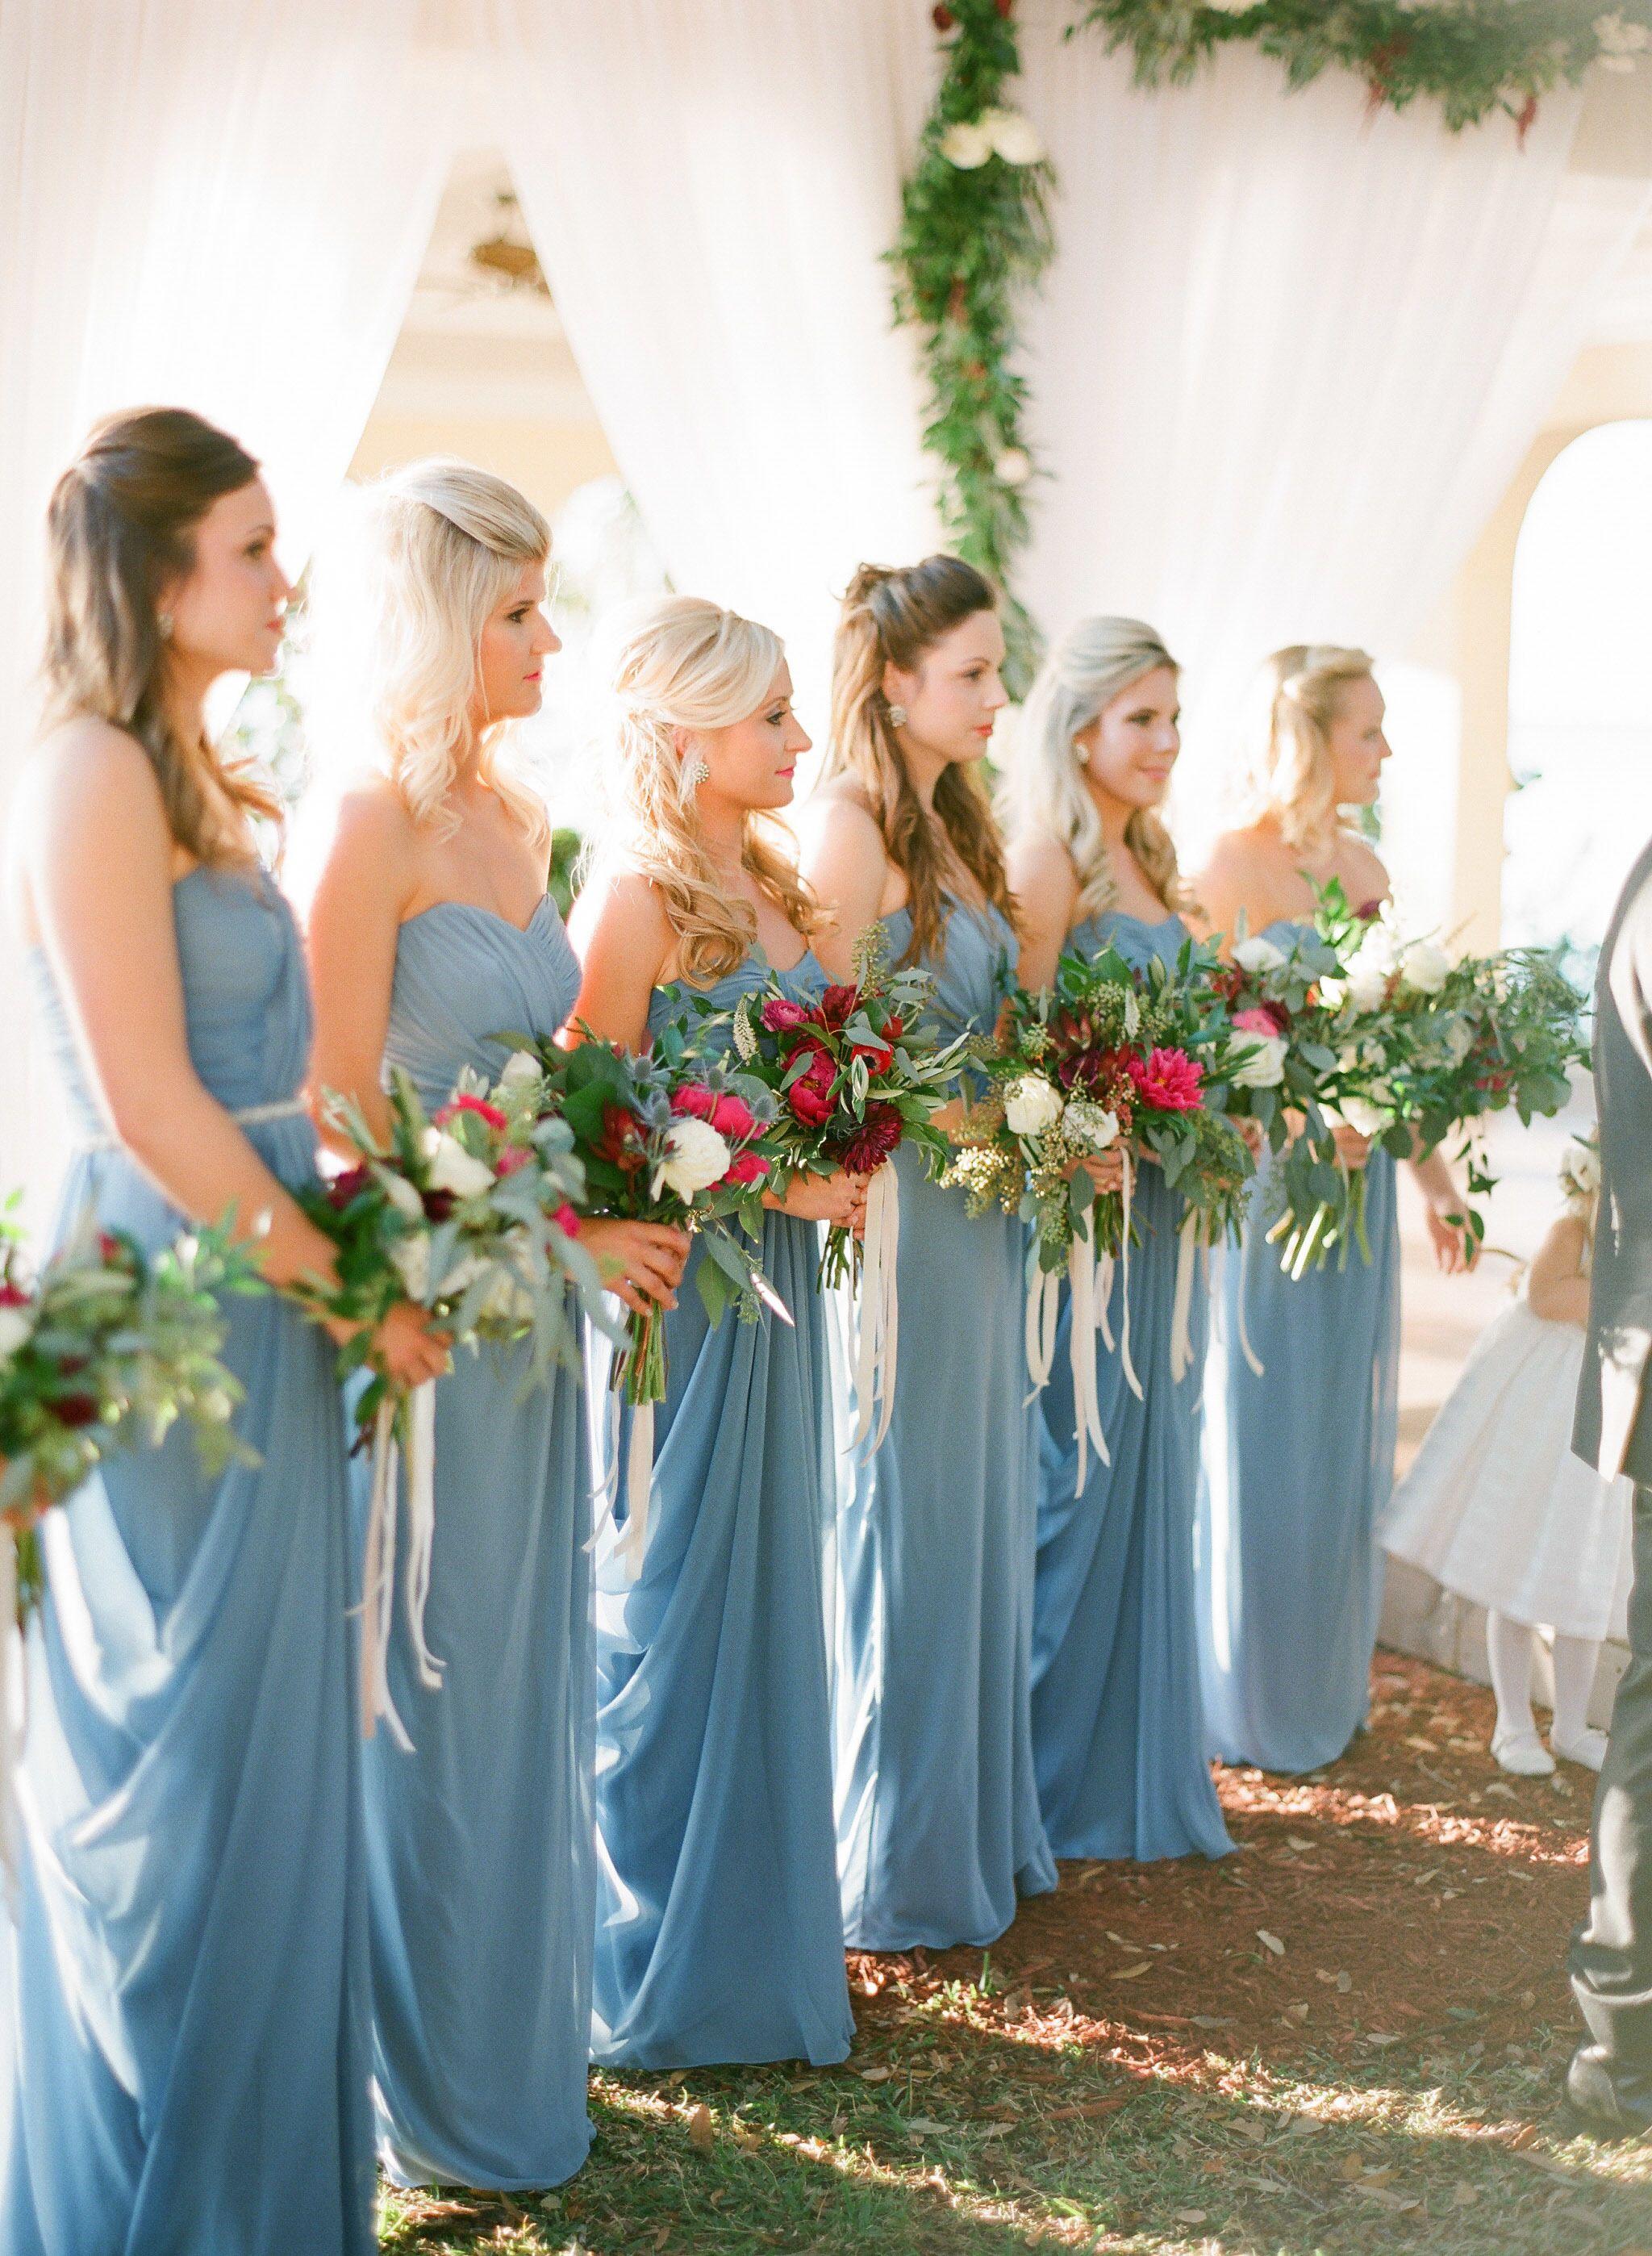 Red + French Blue Al Fresco Estate Wedding | French blue, Fresco and ...